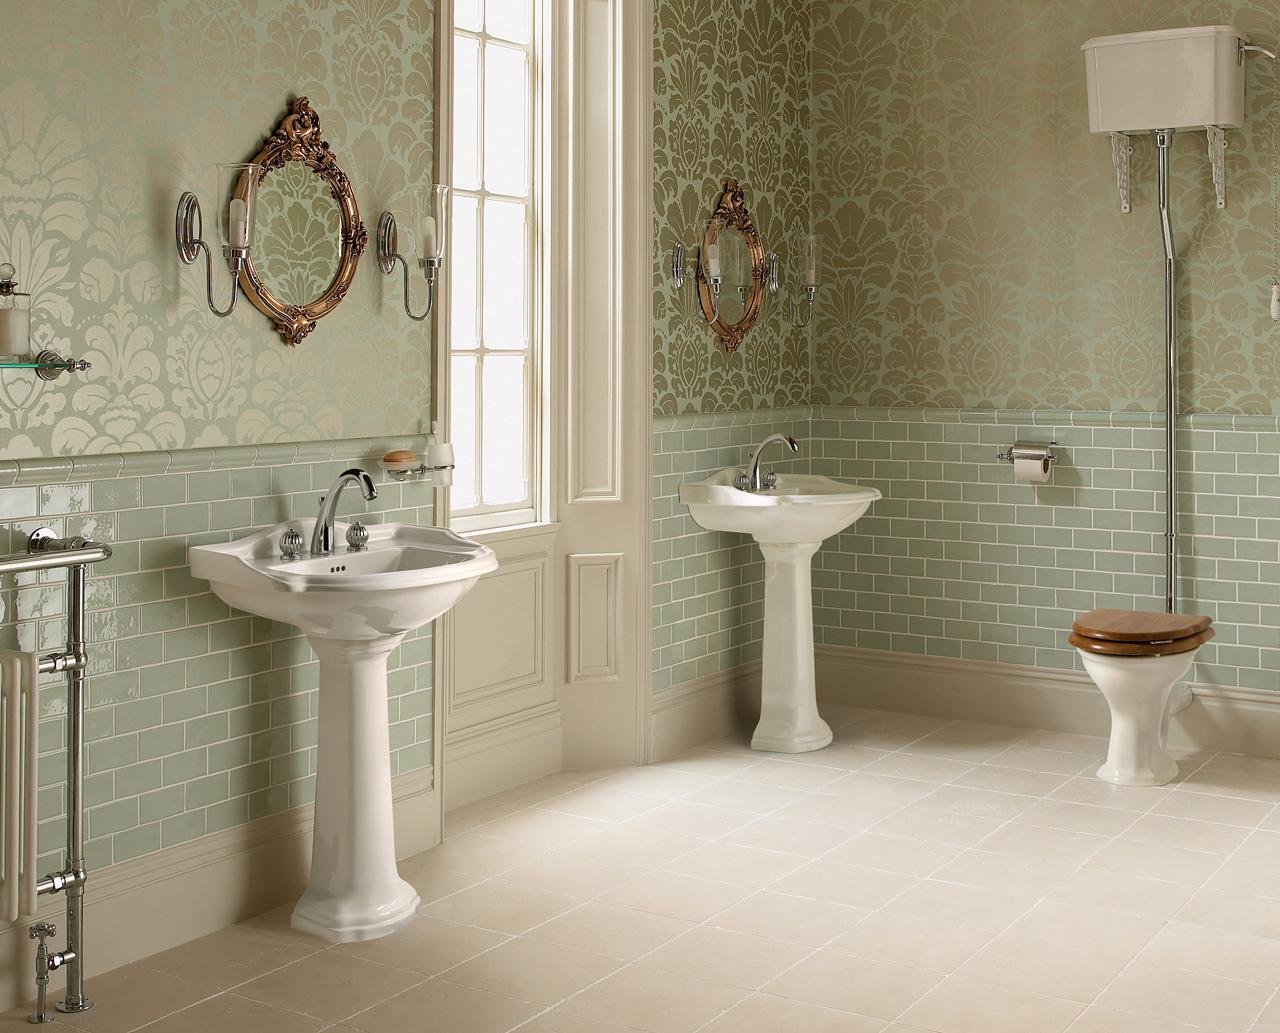 Classic Bathrooms: Imperial Bathrooms - Oxford_main